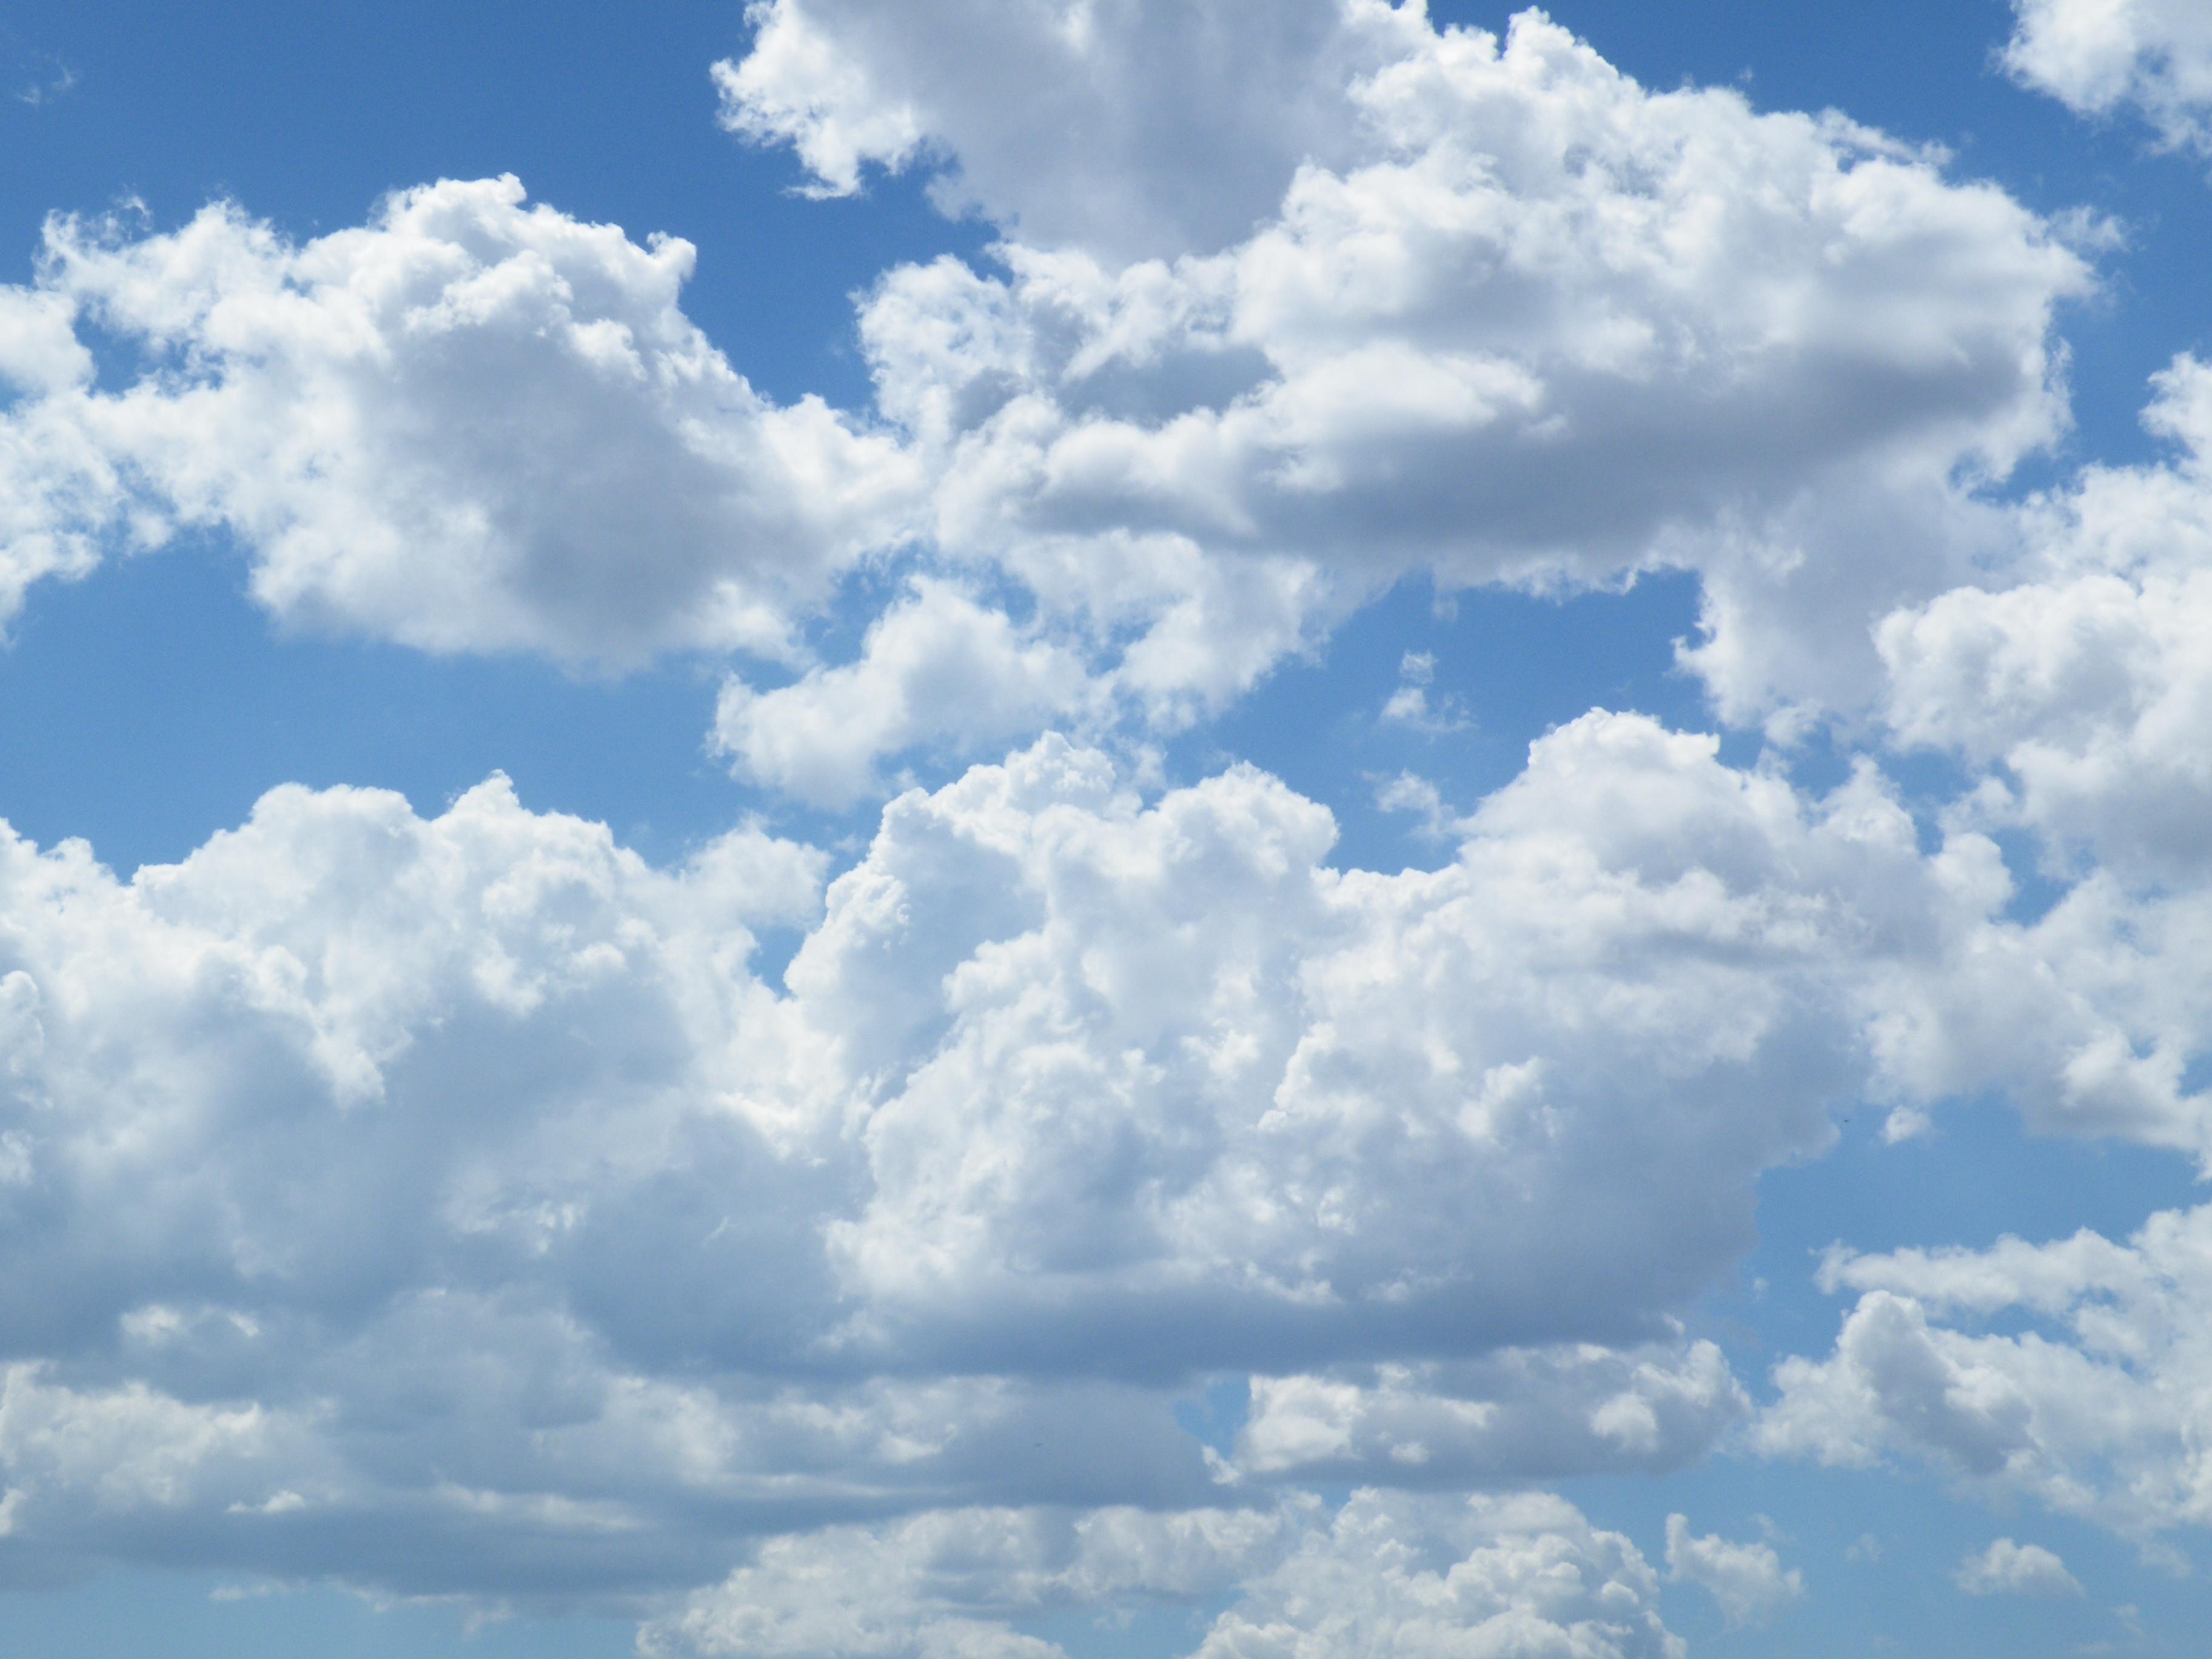 clouds - Vascular Dynamics